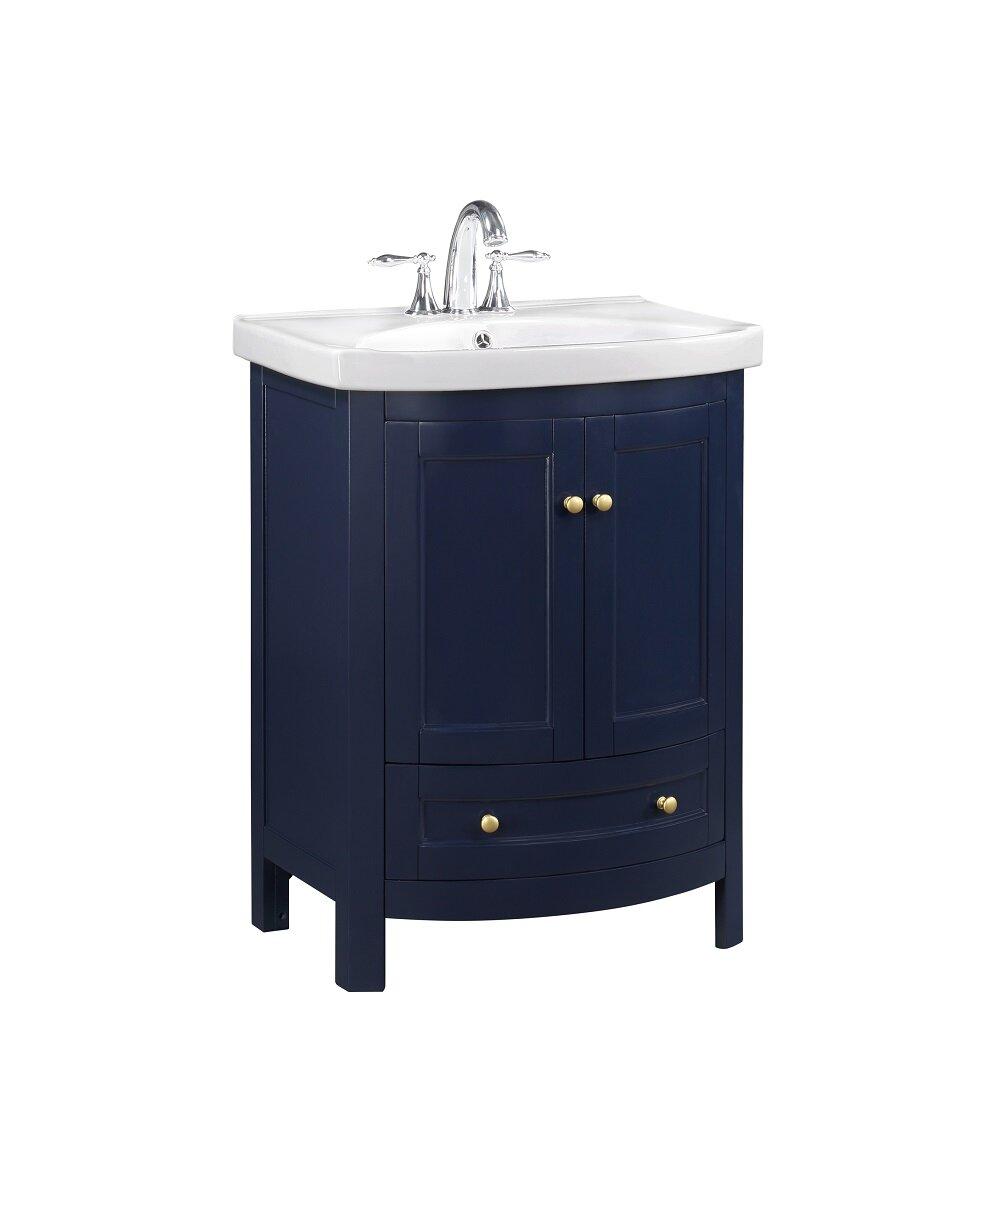 24 Inch Blue Bathroom Vanities Free Shipping Over 35 Wayfair